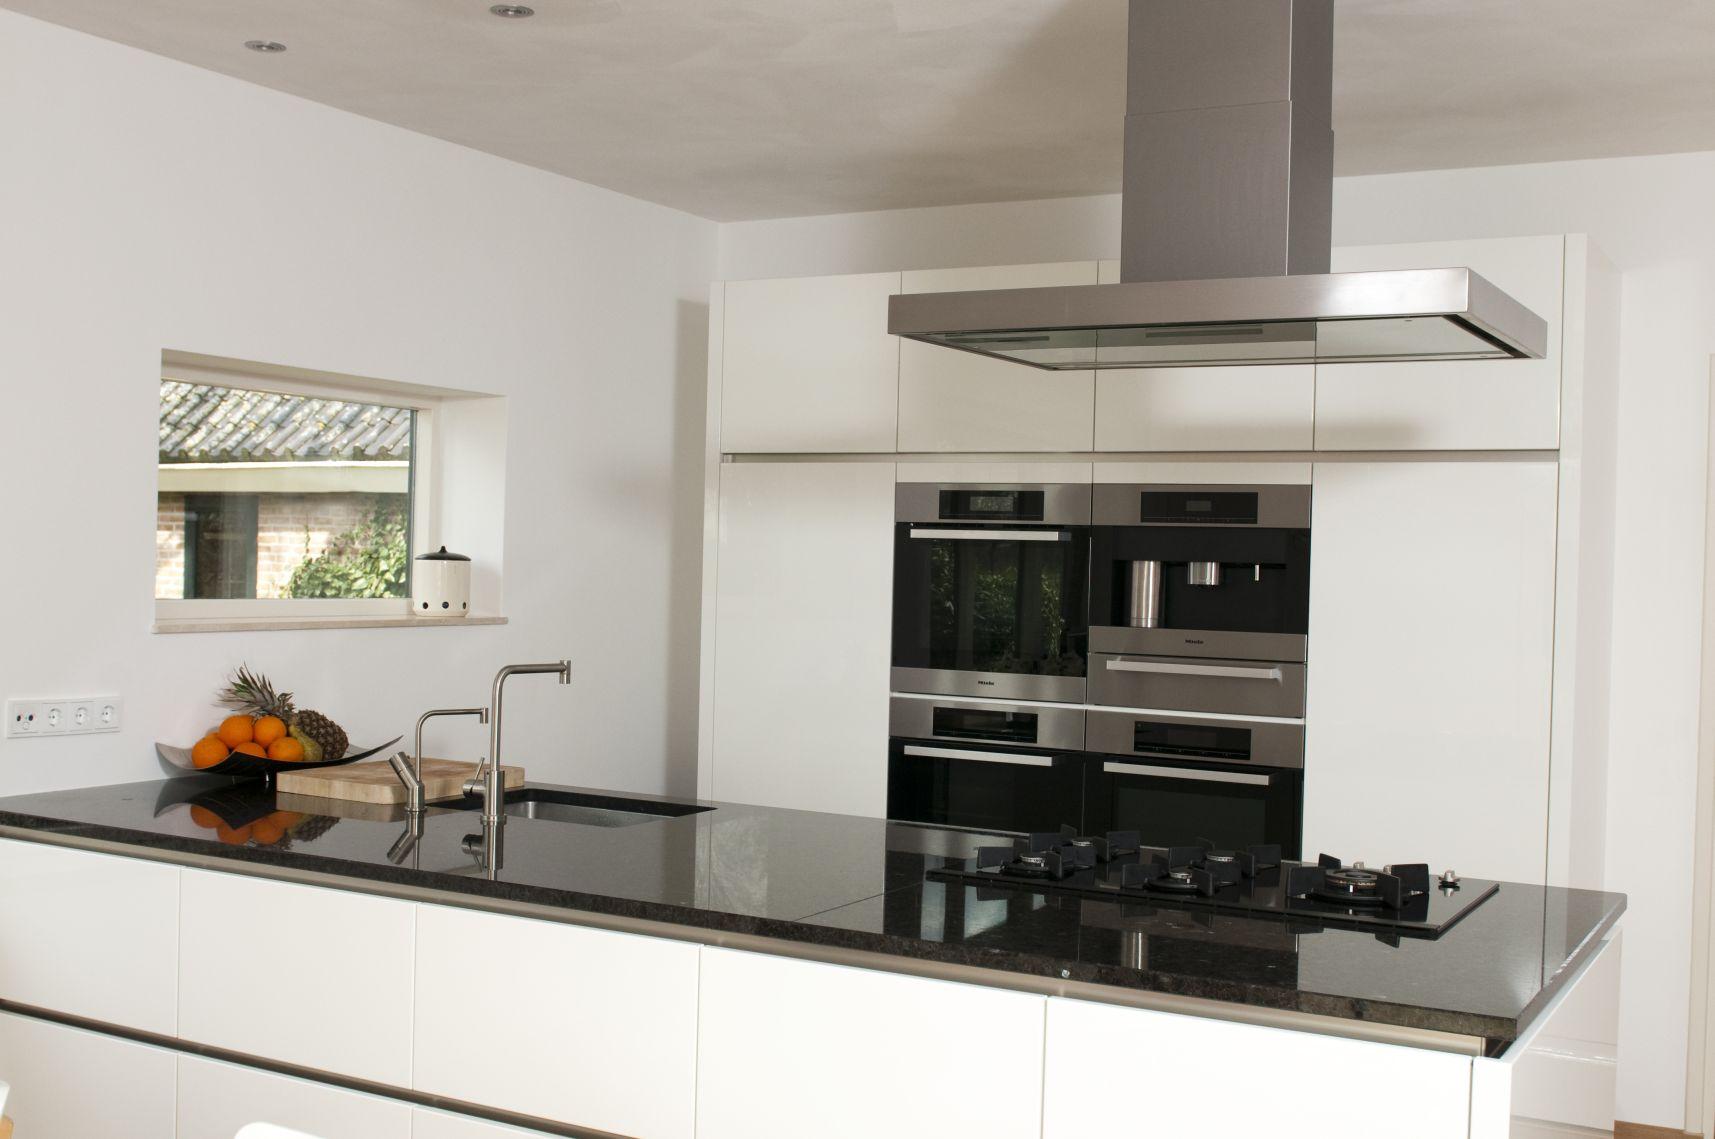 Systemat keuken hoogglans greeploos met miele en quooker twin taps